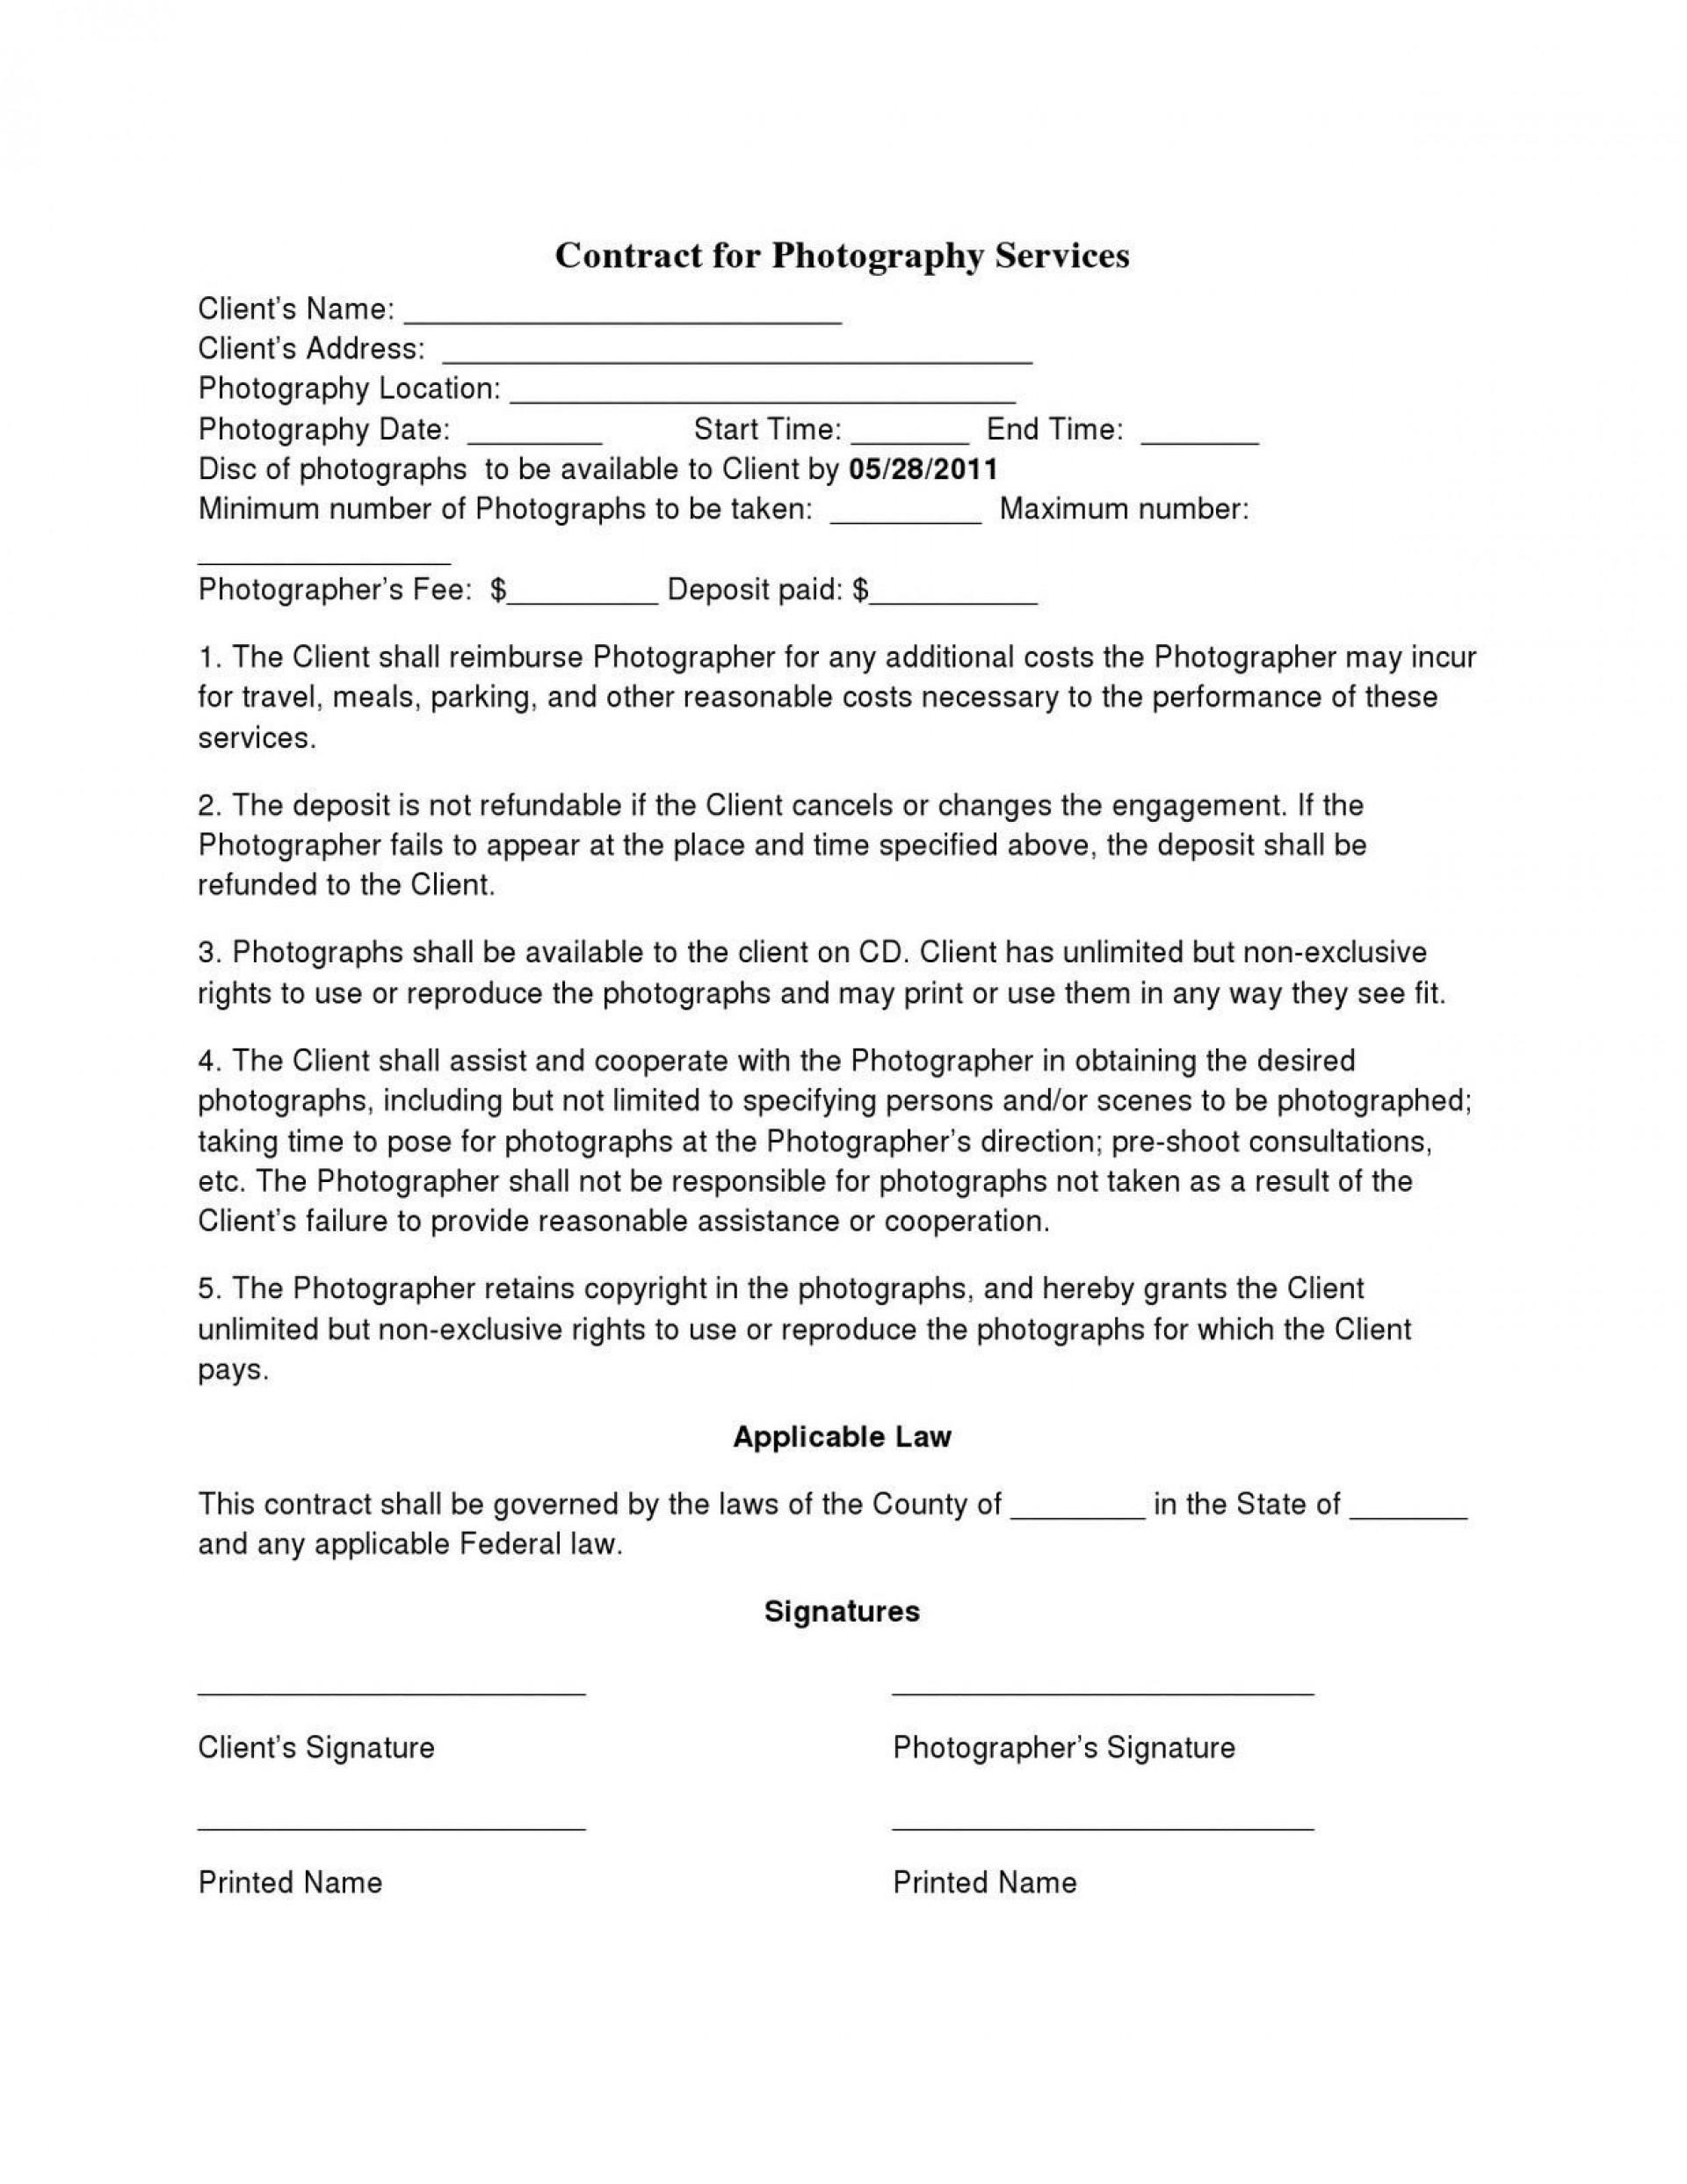 Wedding Photography Contract Template Addictionary